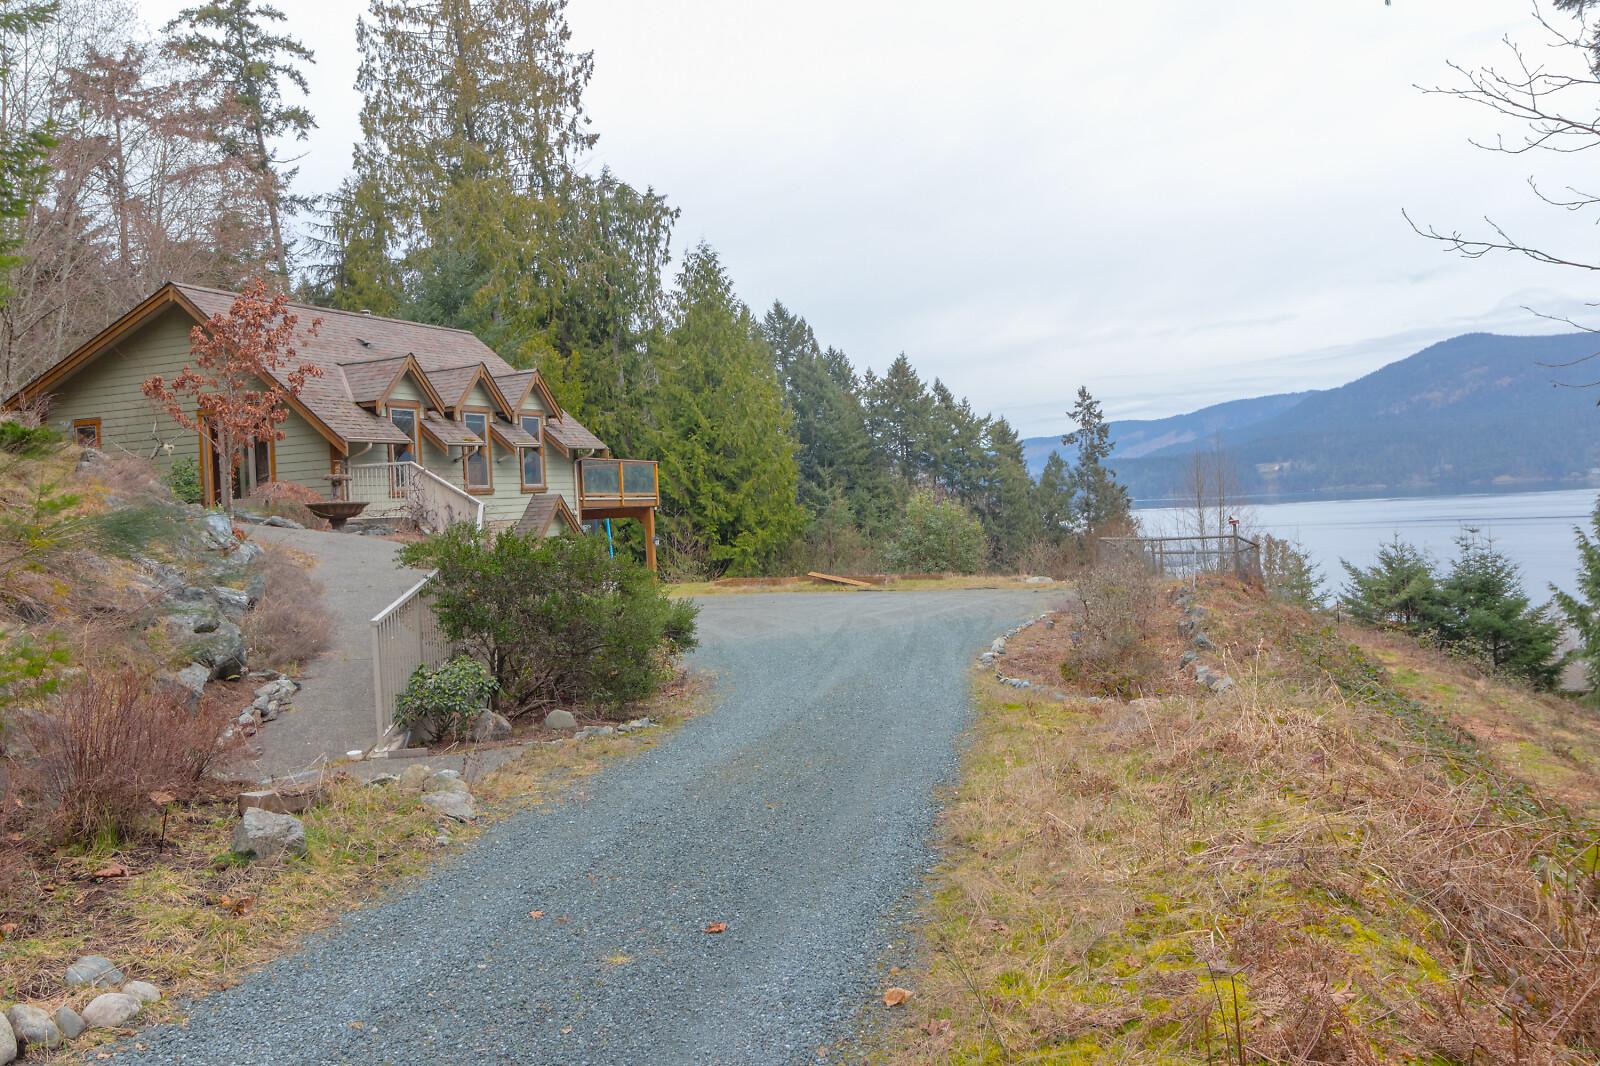 4362 Brentview Dr, Cowichan Bay, British Columbia  V0R 1N2 - Photo 2 - 868691